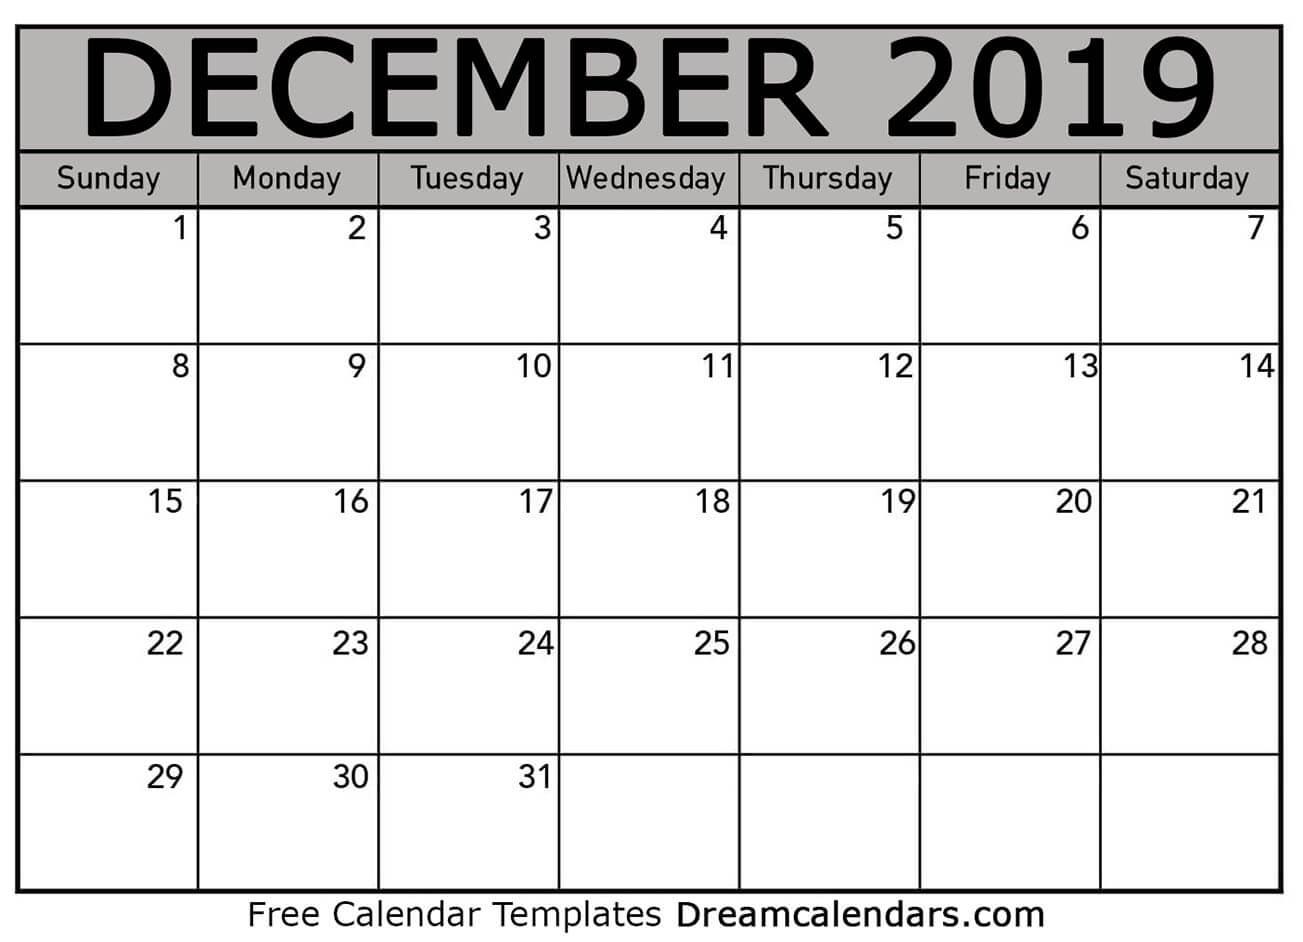 picture regarding December Printable Calendar Free called Printable December 2019 Calendar